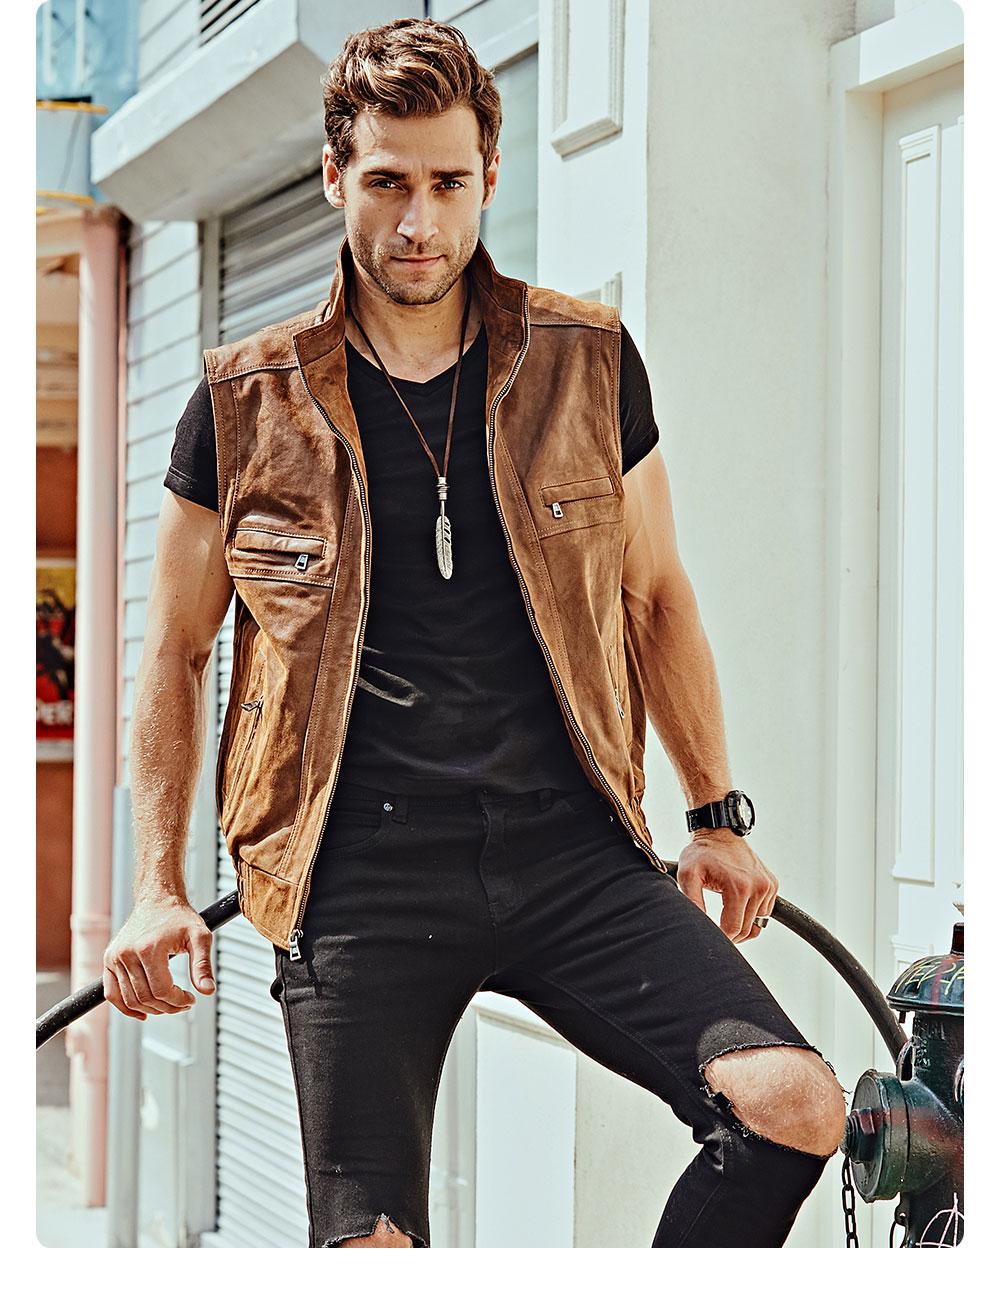 H567d5044fddd4a3e9139c1a9e26375d0y Mew Men's Leather Retro Vest Stand Collar Men's Motorcycle Casual Vest